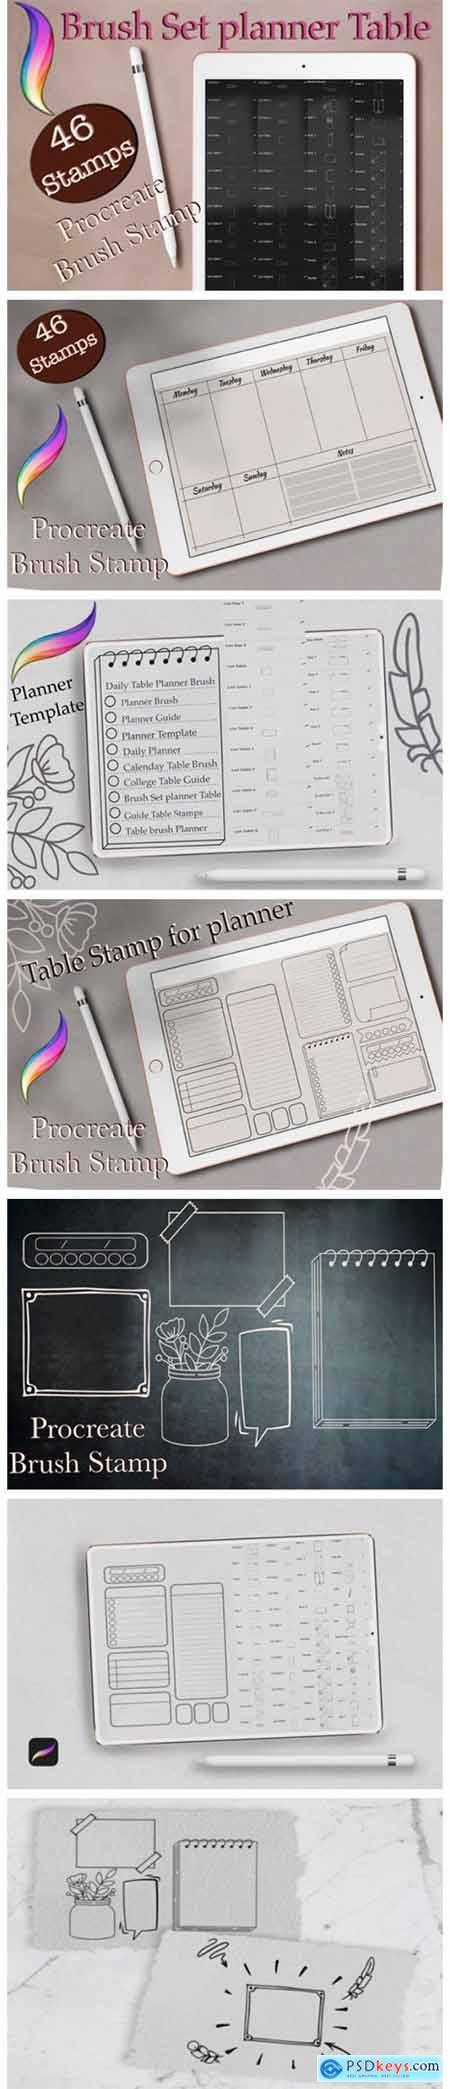 46 Planner Stamps, Brush Stamp Planner 7156963